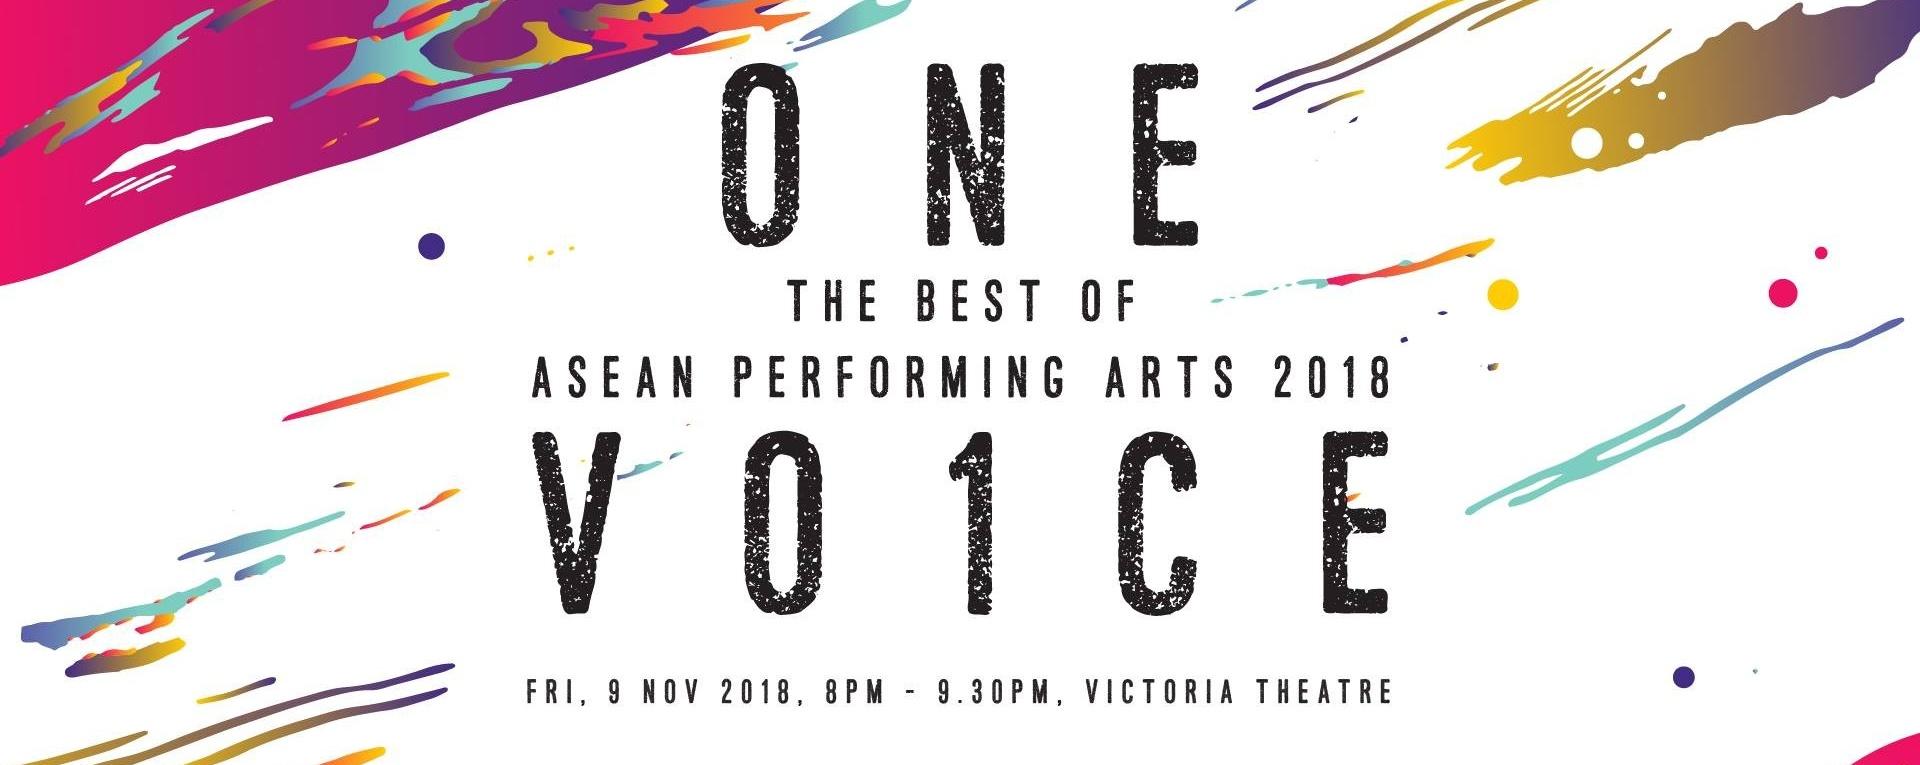 The Best of ASEAN Performing Arts 2018